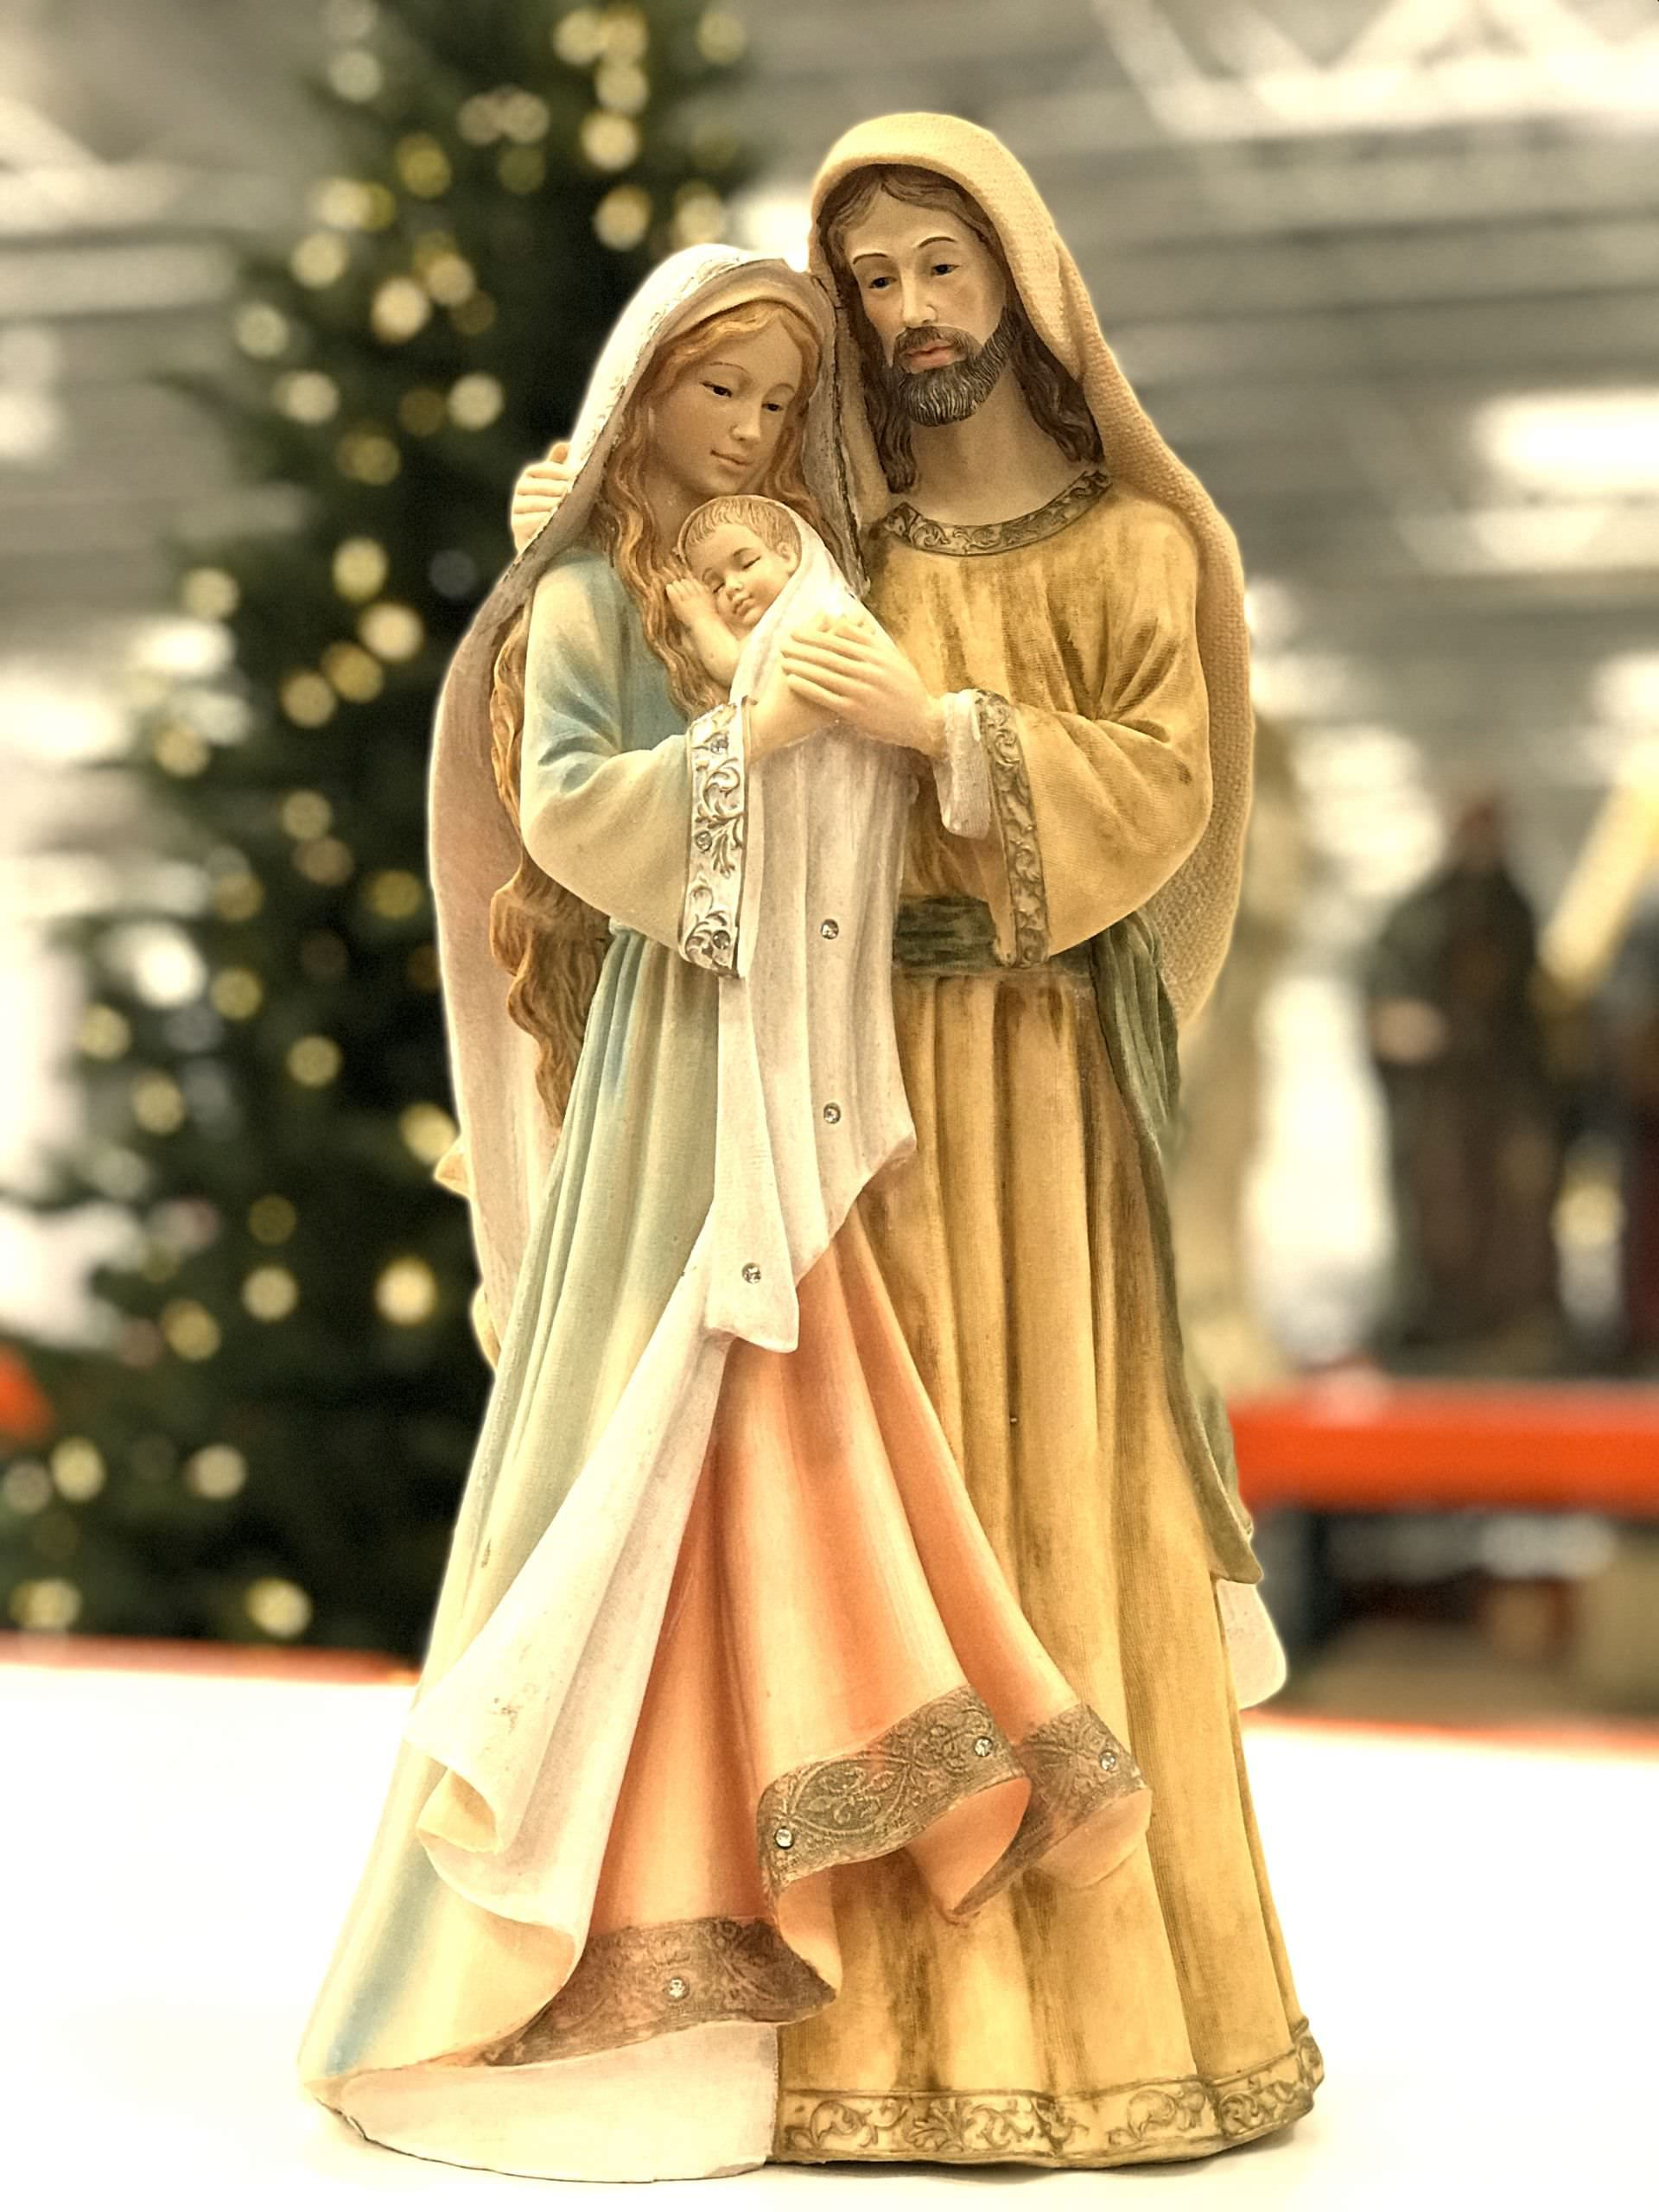 Imagenes Sagrada Familia Navidad.Imagen Fotografia Catolica De Alta Resolucion Etiquetada